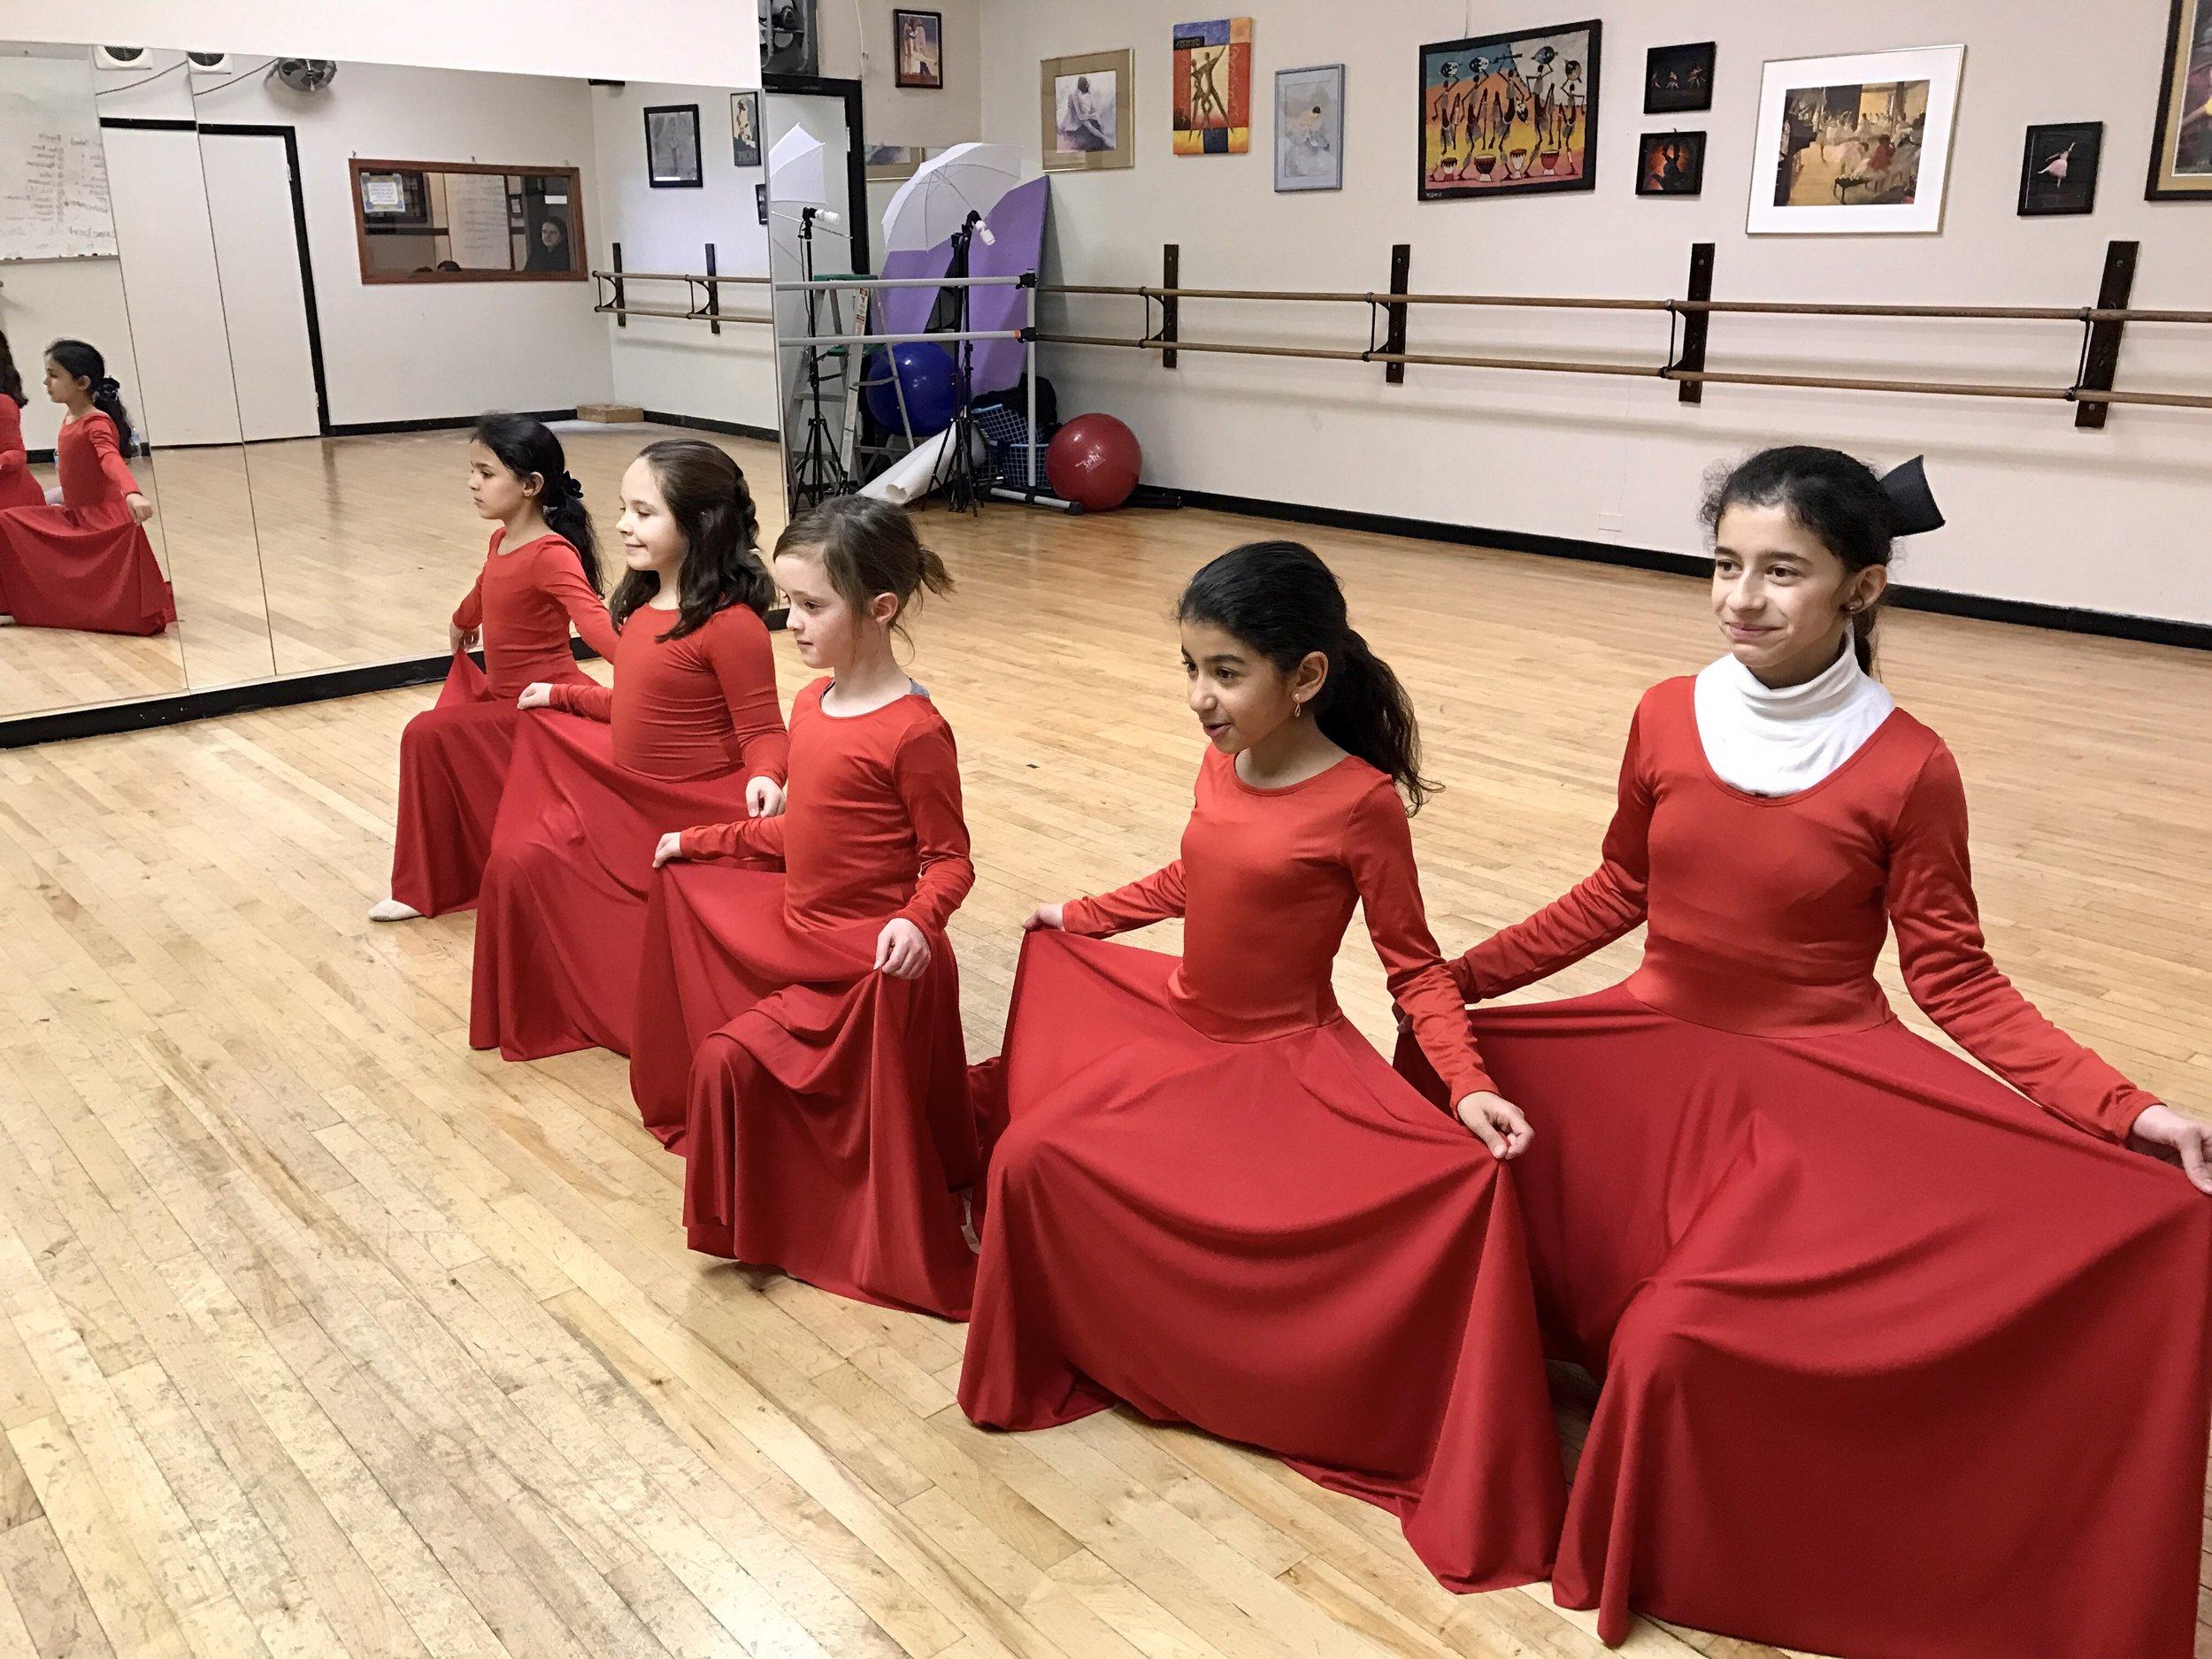 refugee dance recital preparations